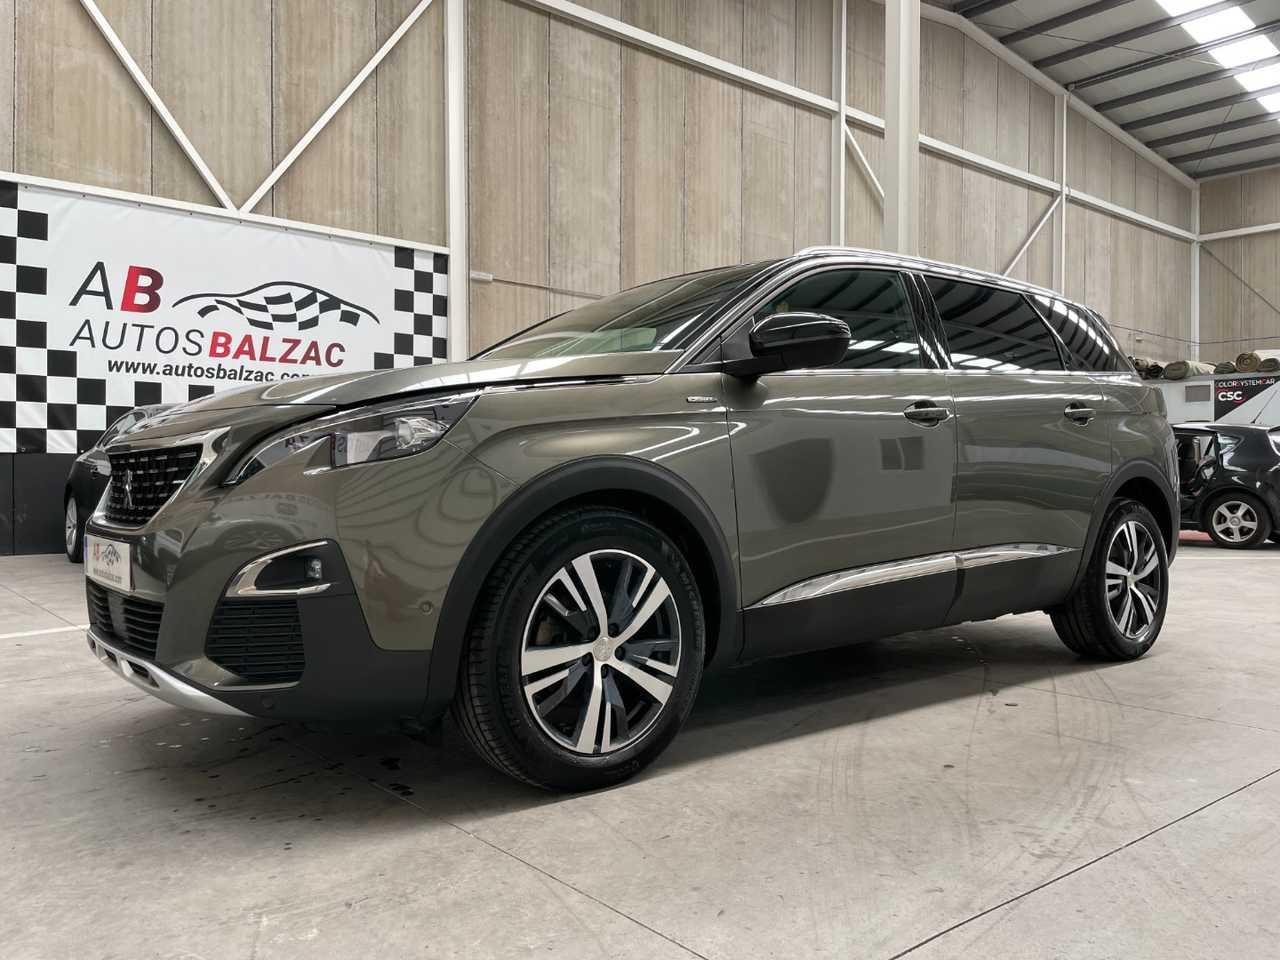 Peugeot 5008 ocasión segunda mano 2017 Diésel por 24.990€ en Málaga